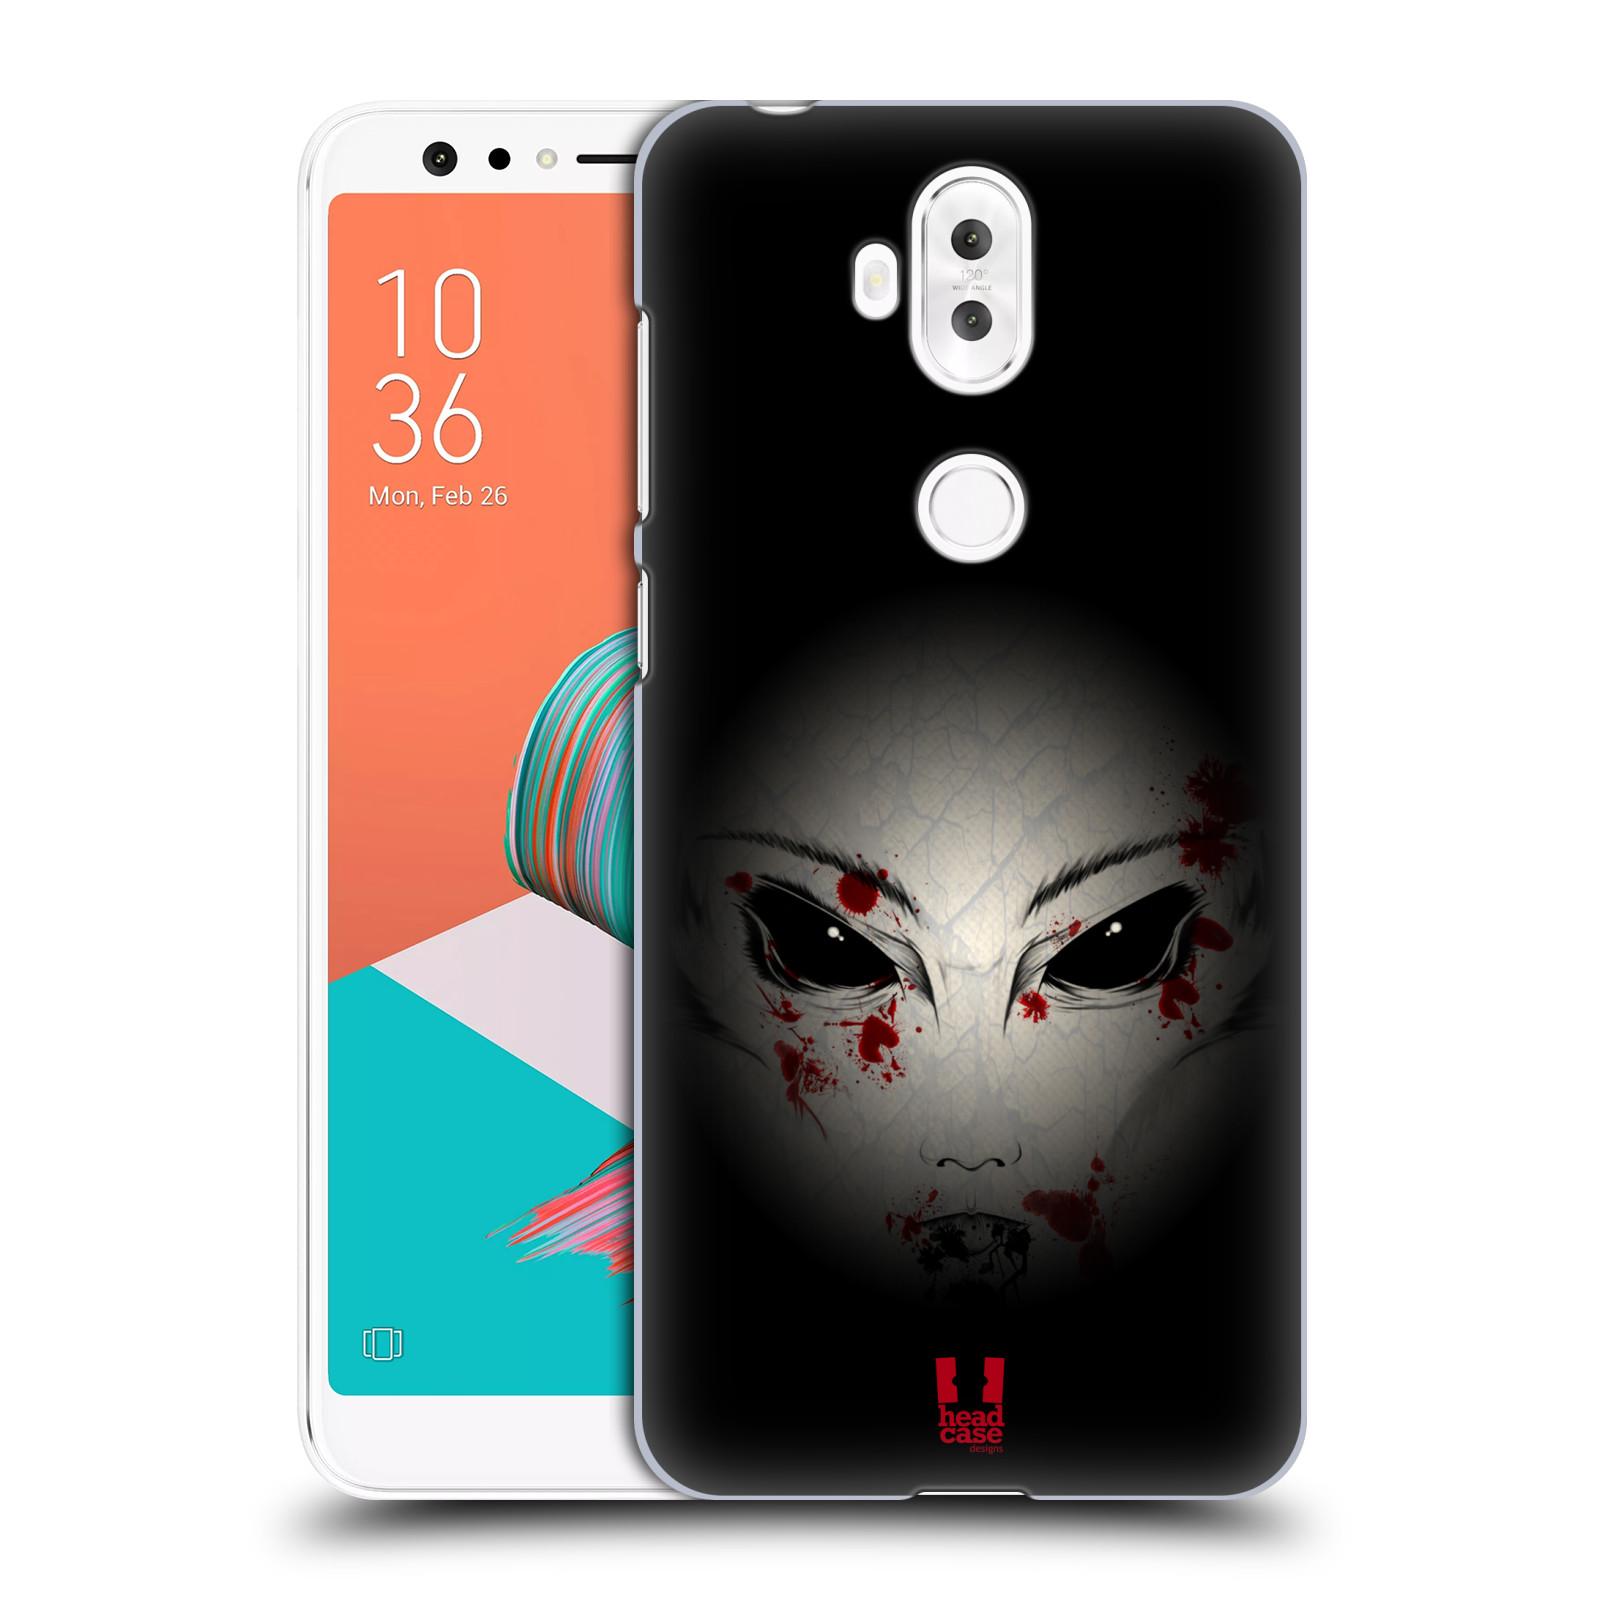 Plastové pouzdro na mobil Asus ZenFone 5 Lite ZC600KL - Head Case - Macabre (Plastový kryt či obal na mobilní telefon Asus ZenFone 5 Lite (ZC600KL) s motivem Macabre)